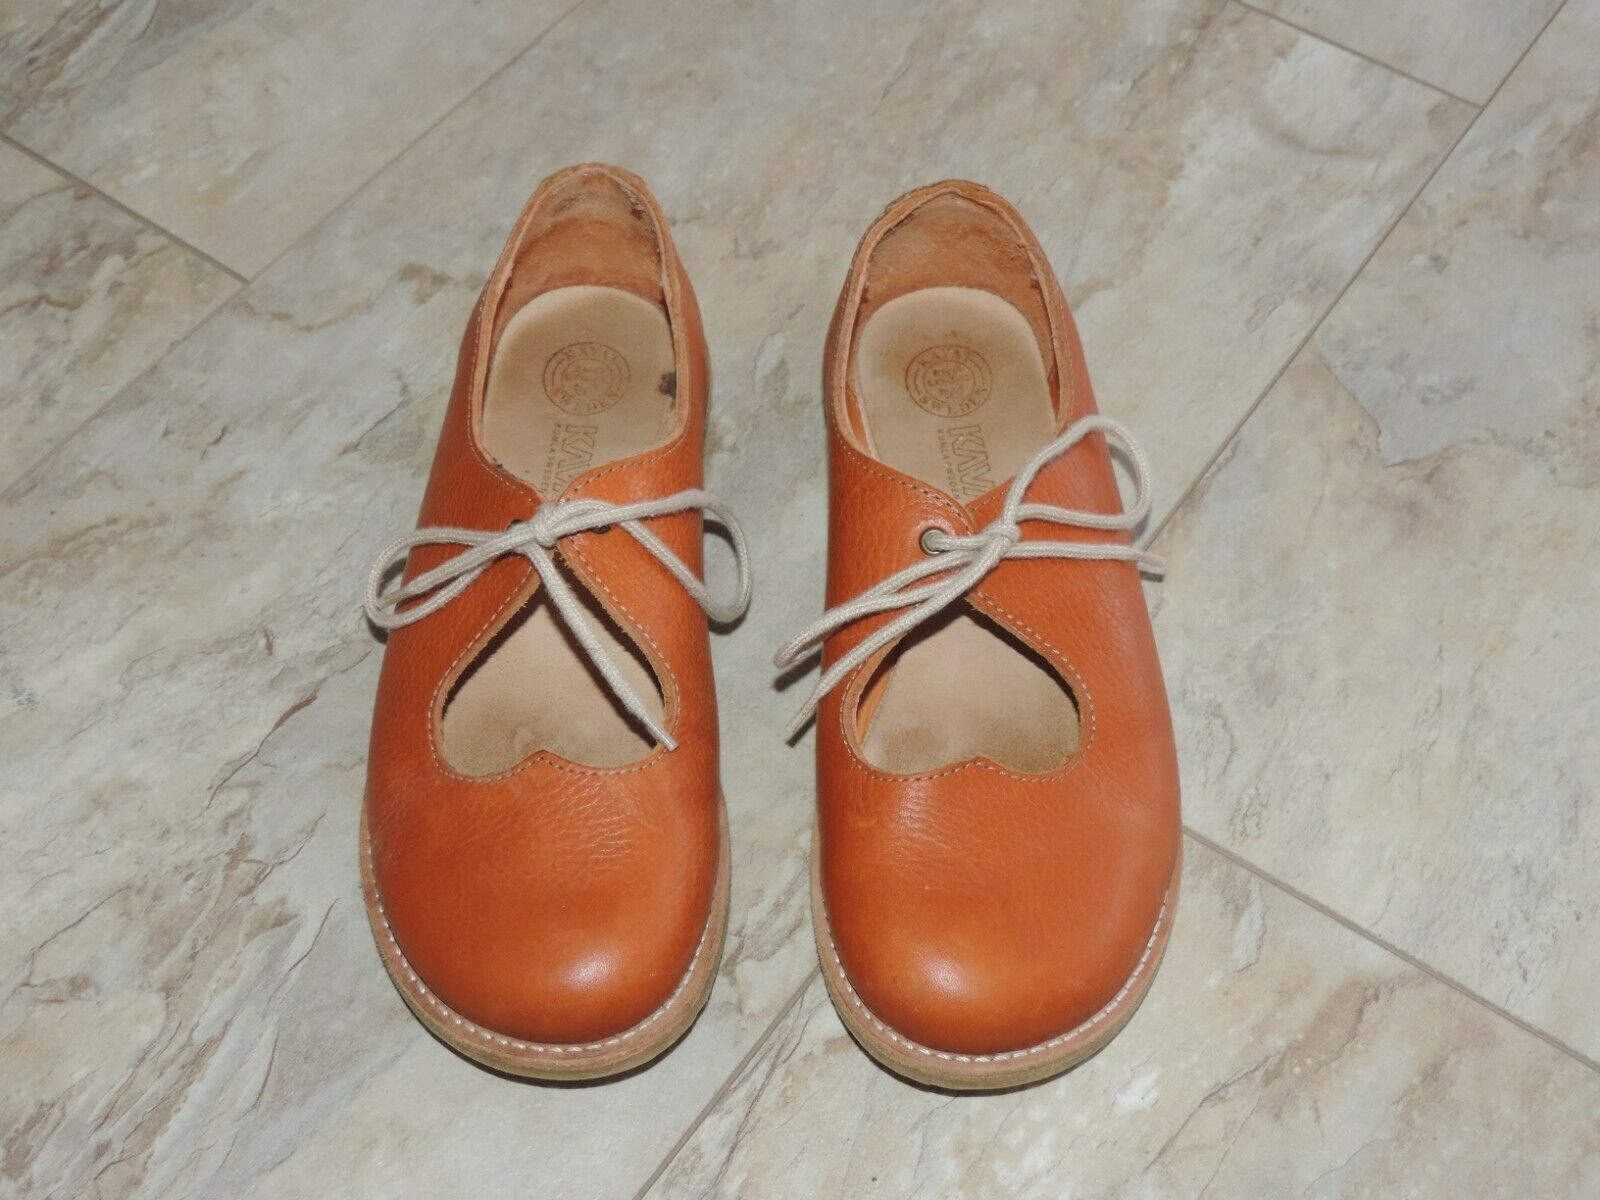 T.U.K. Ankle Boot LEATHER CREEP WEDGE A8379L Damen Schuhe